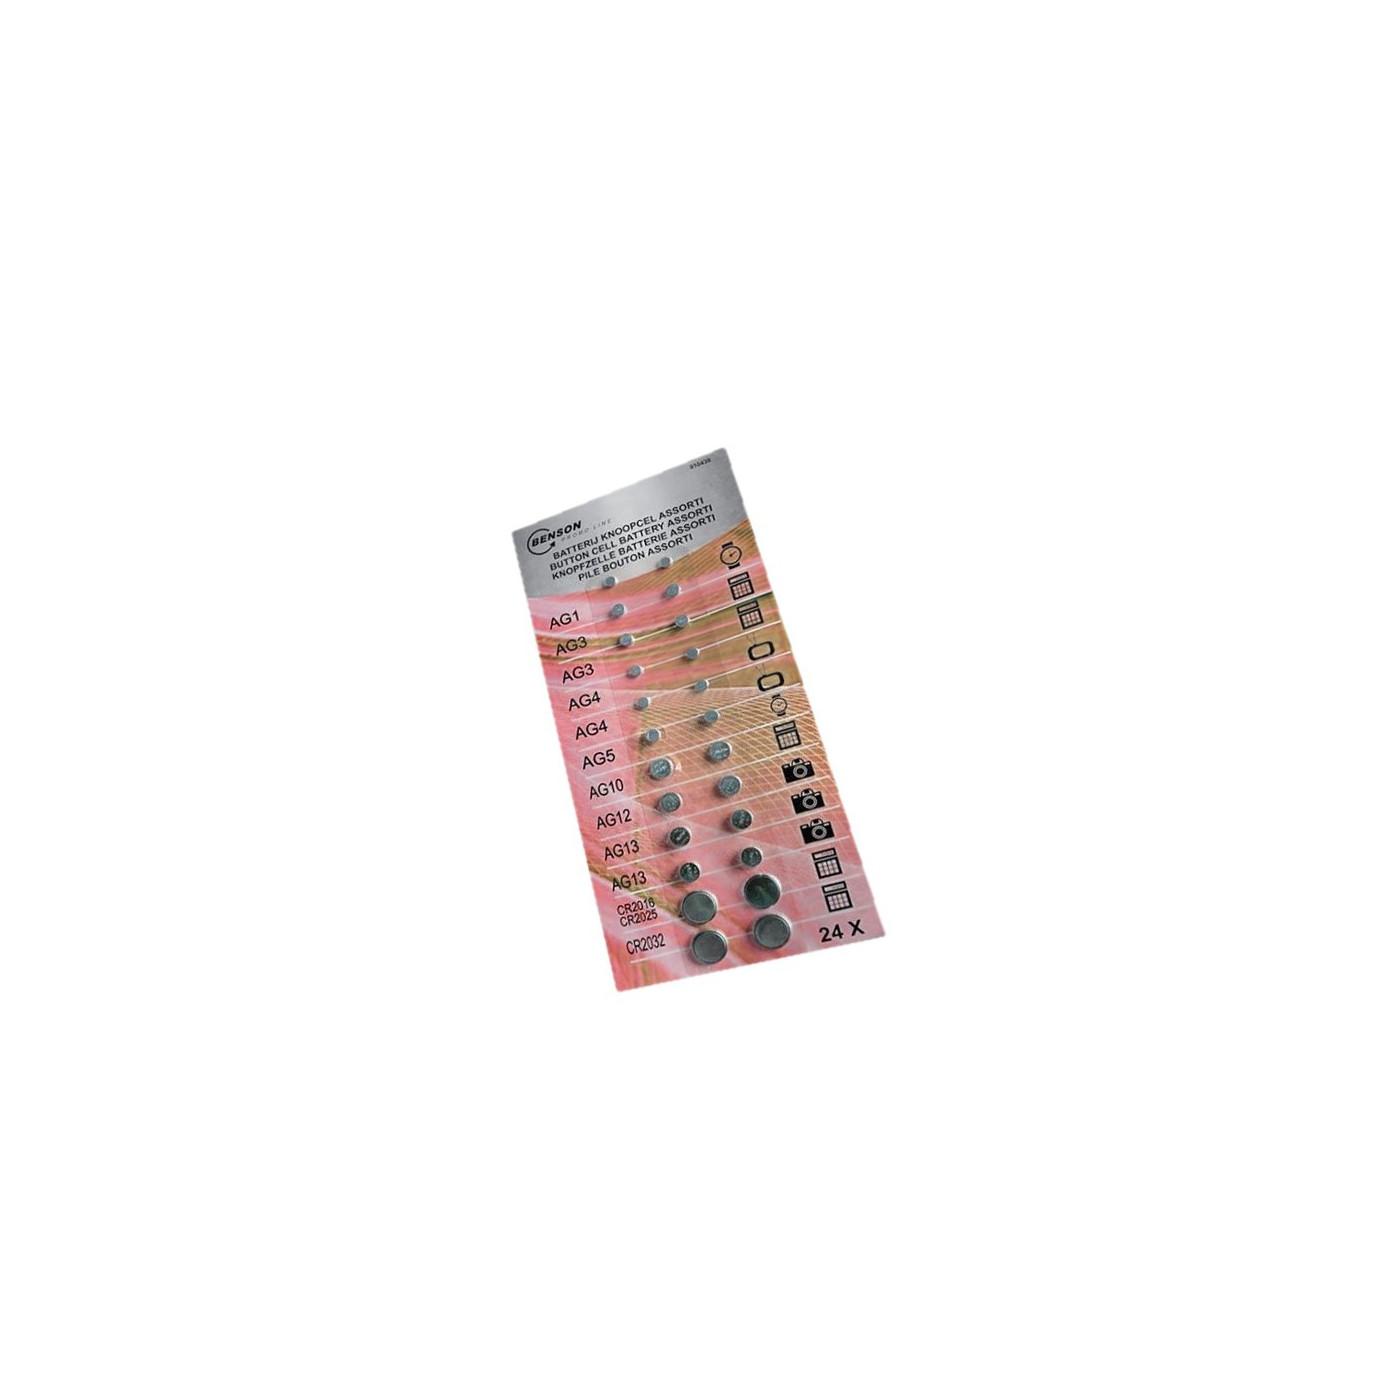 Ensemble de piles bouton (grand paquet)  - 1